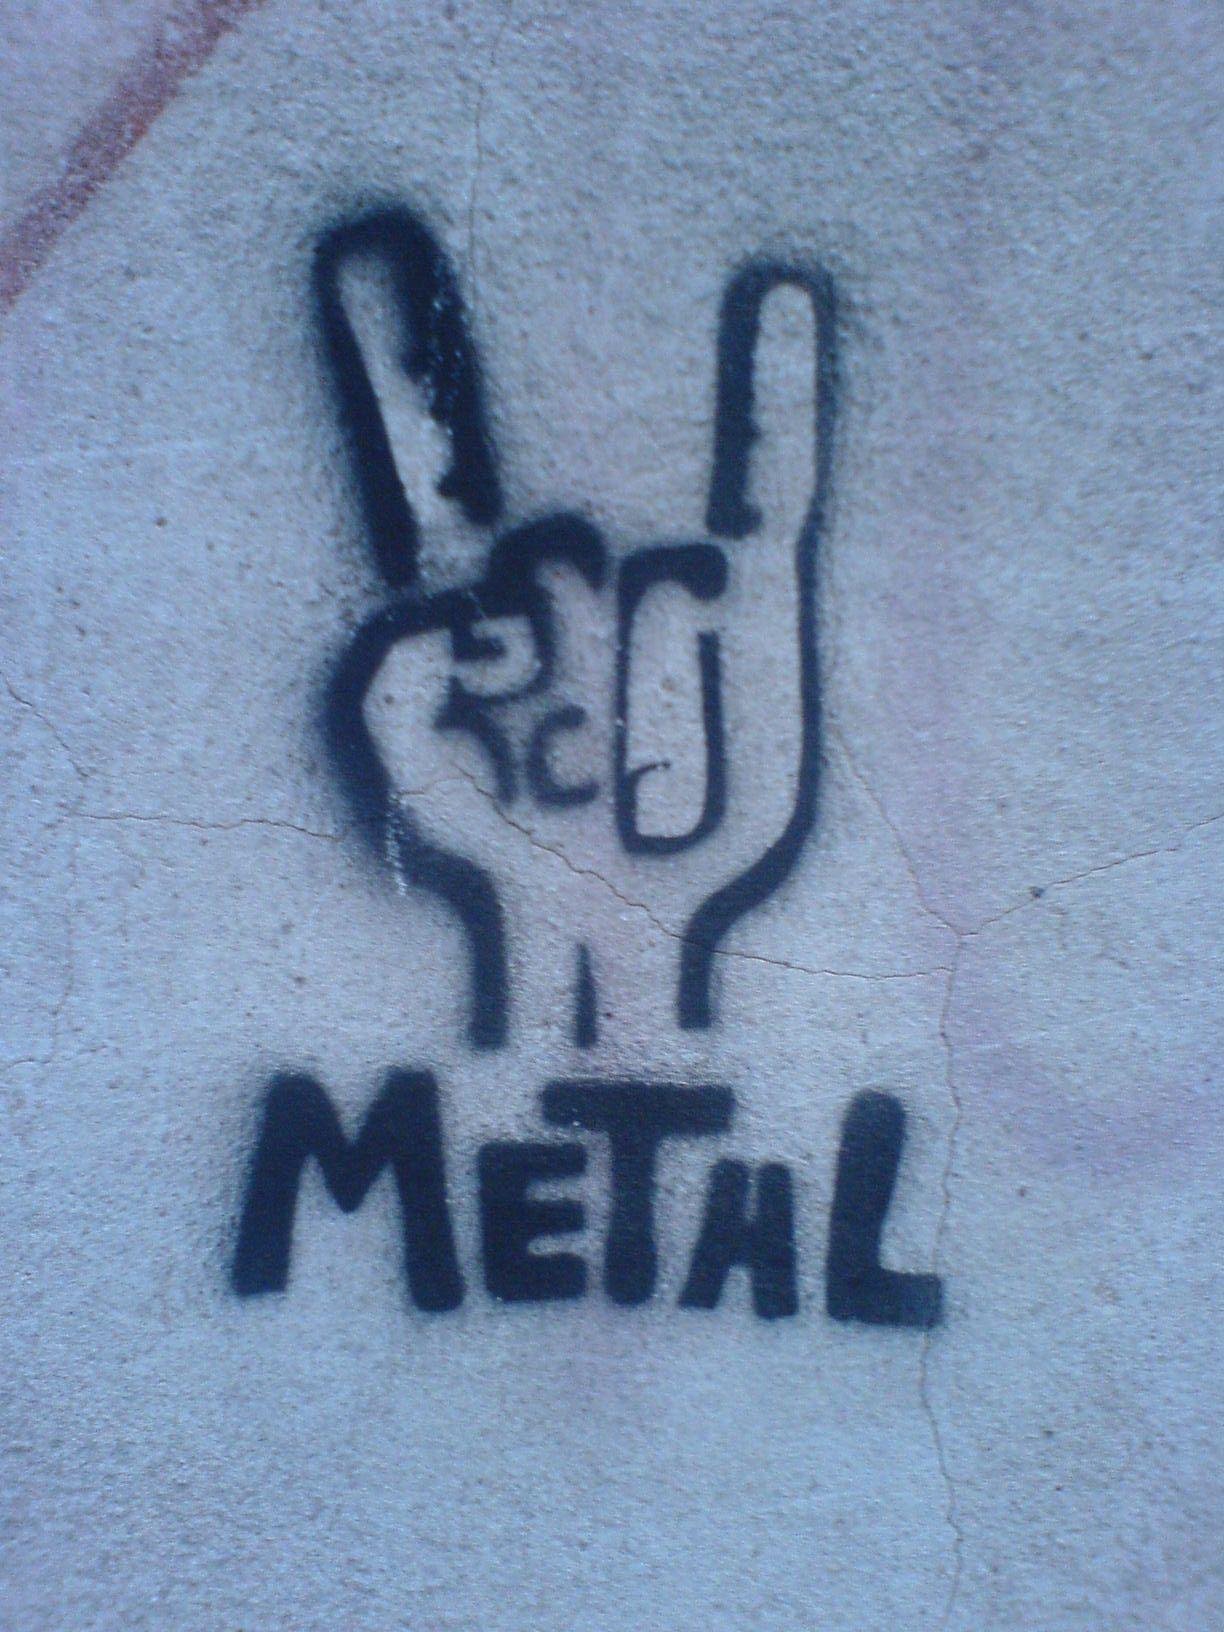 I love everything Metal ;)